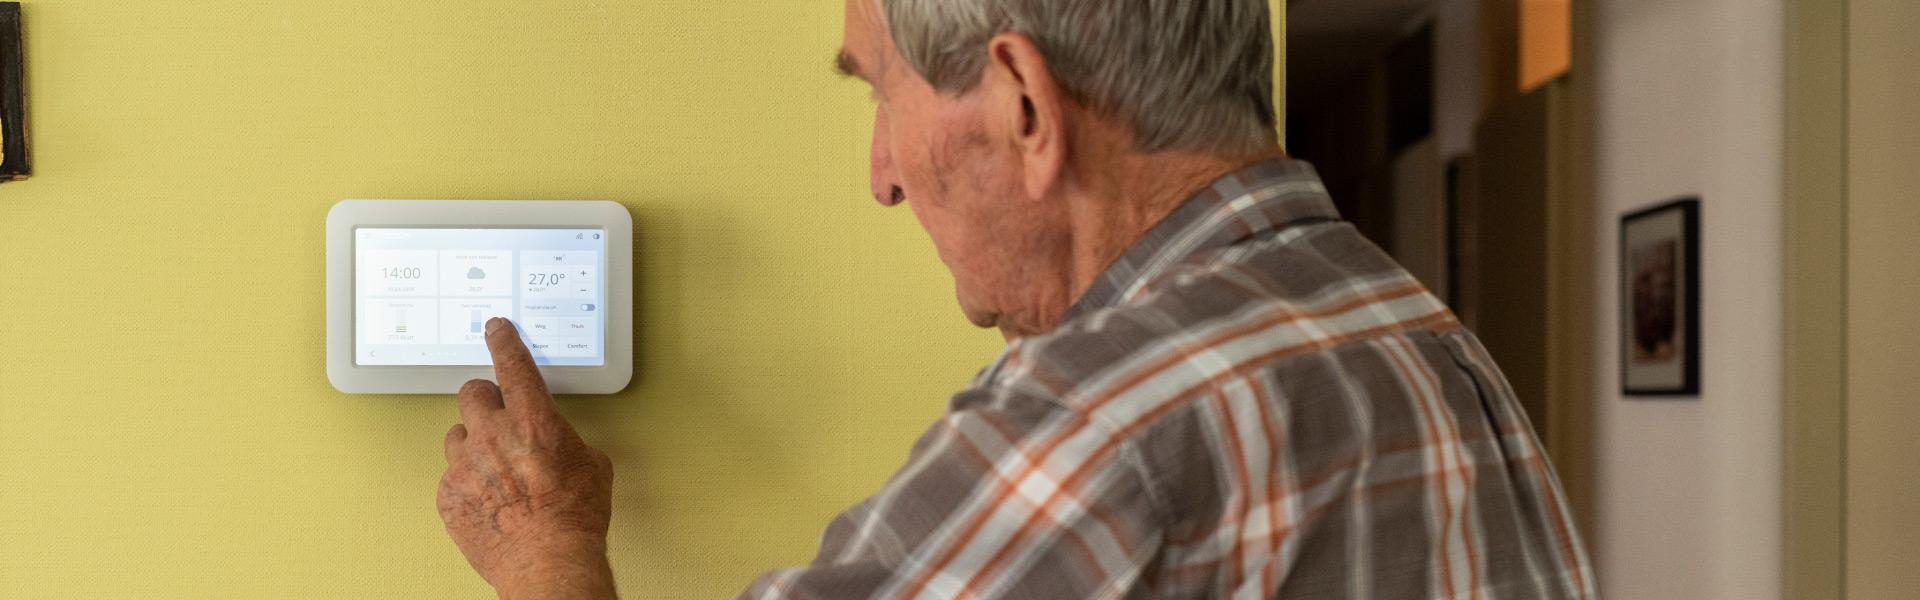 Smart Home Veilig Thuis Oude Man